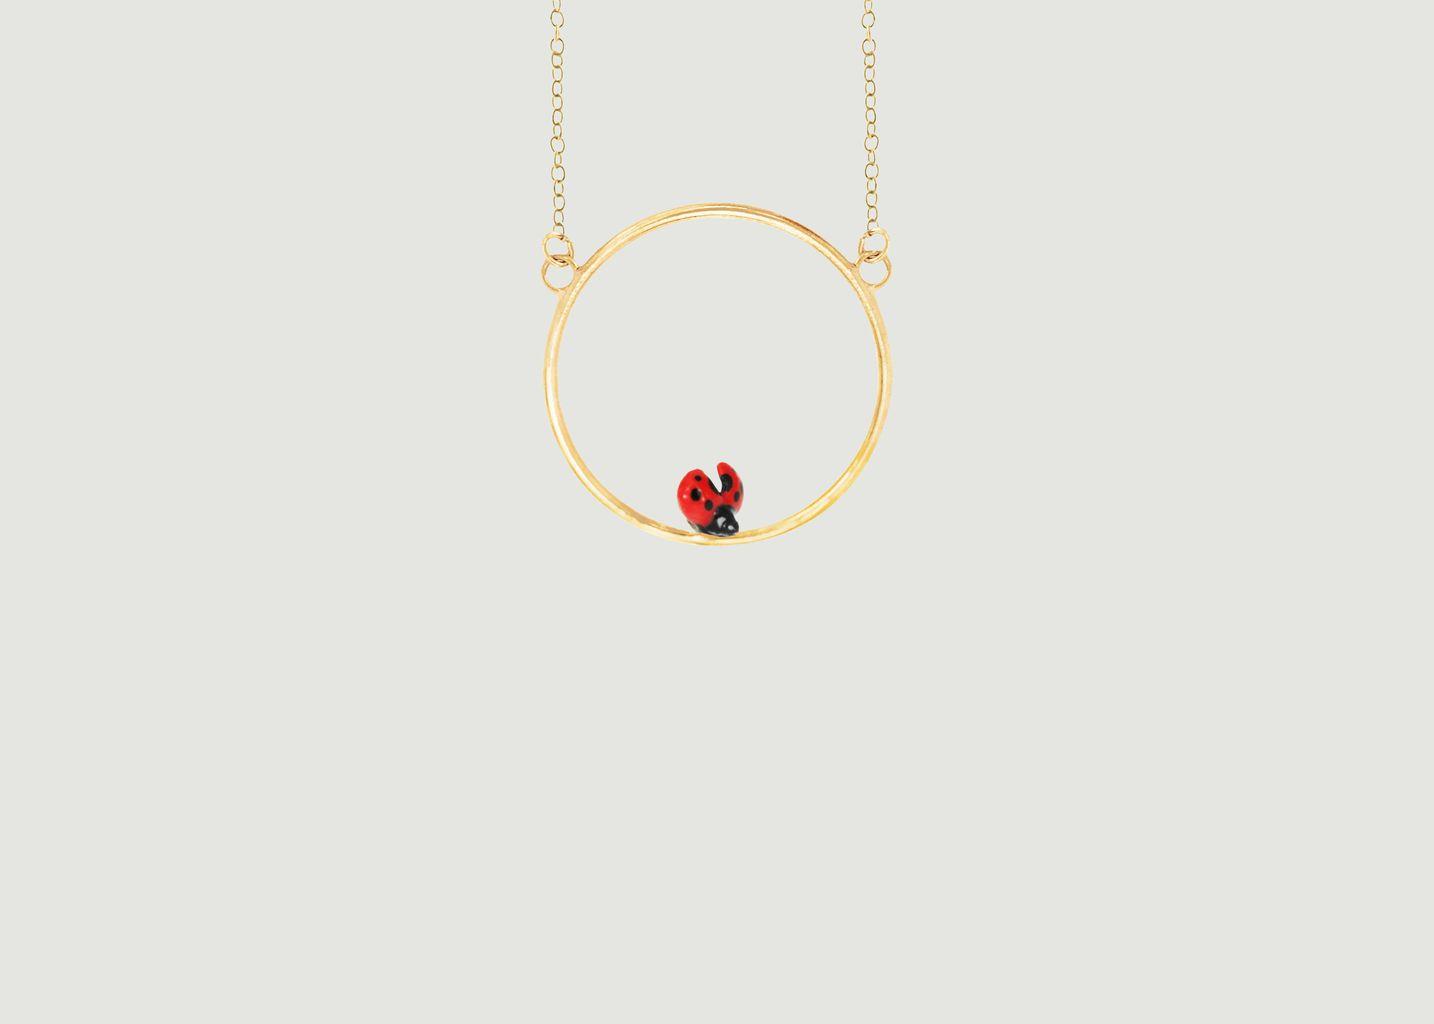 Mini Collier Ladybug - Nach